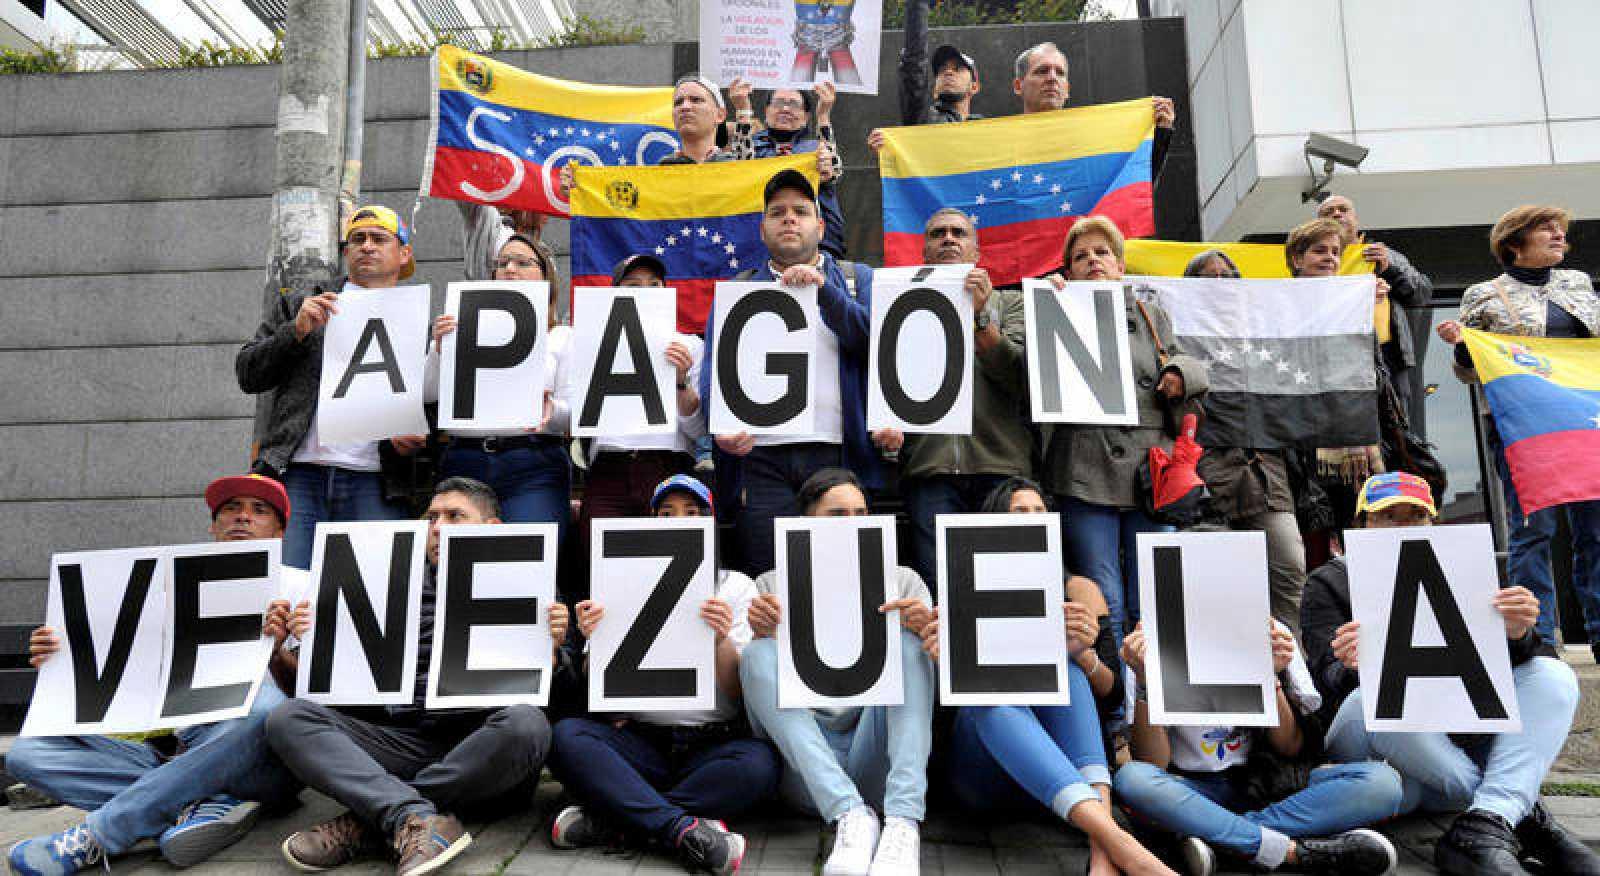 Venezuelan citizens living in Bogota protest against Venezuela's President Maduro and the power outage in Venezuela